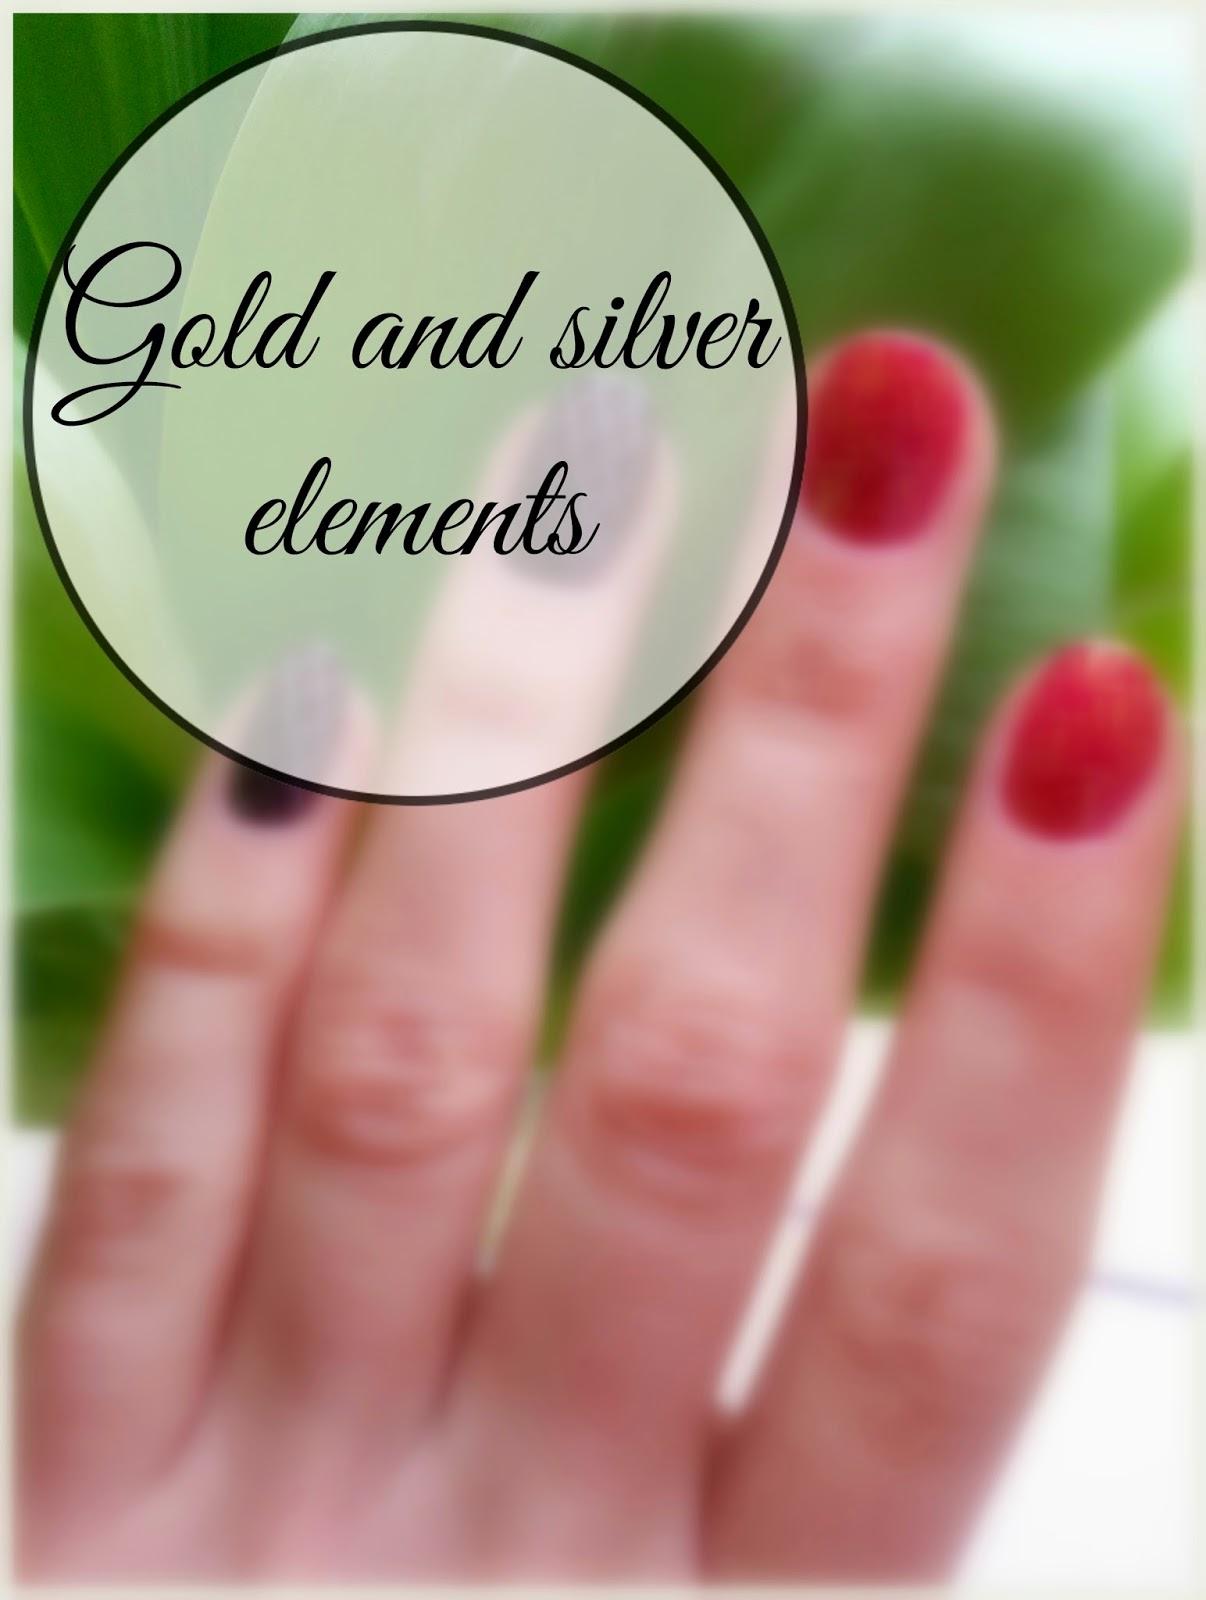 paznokcie ze złotem i srebrem